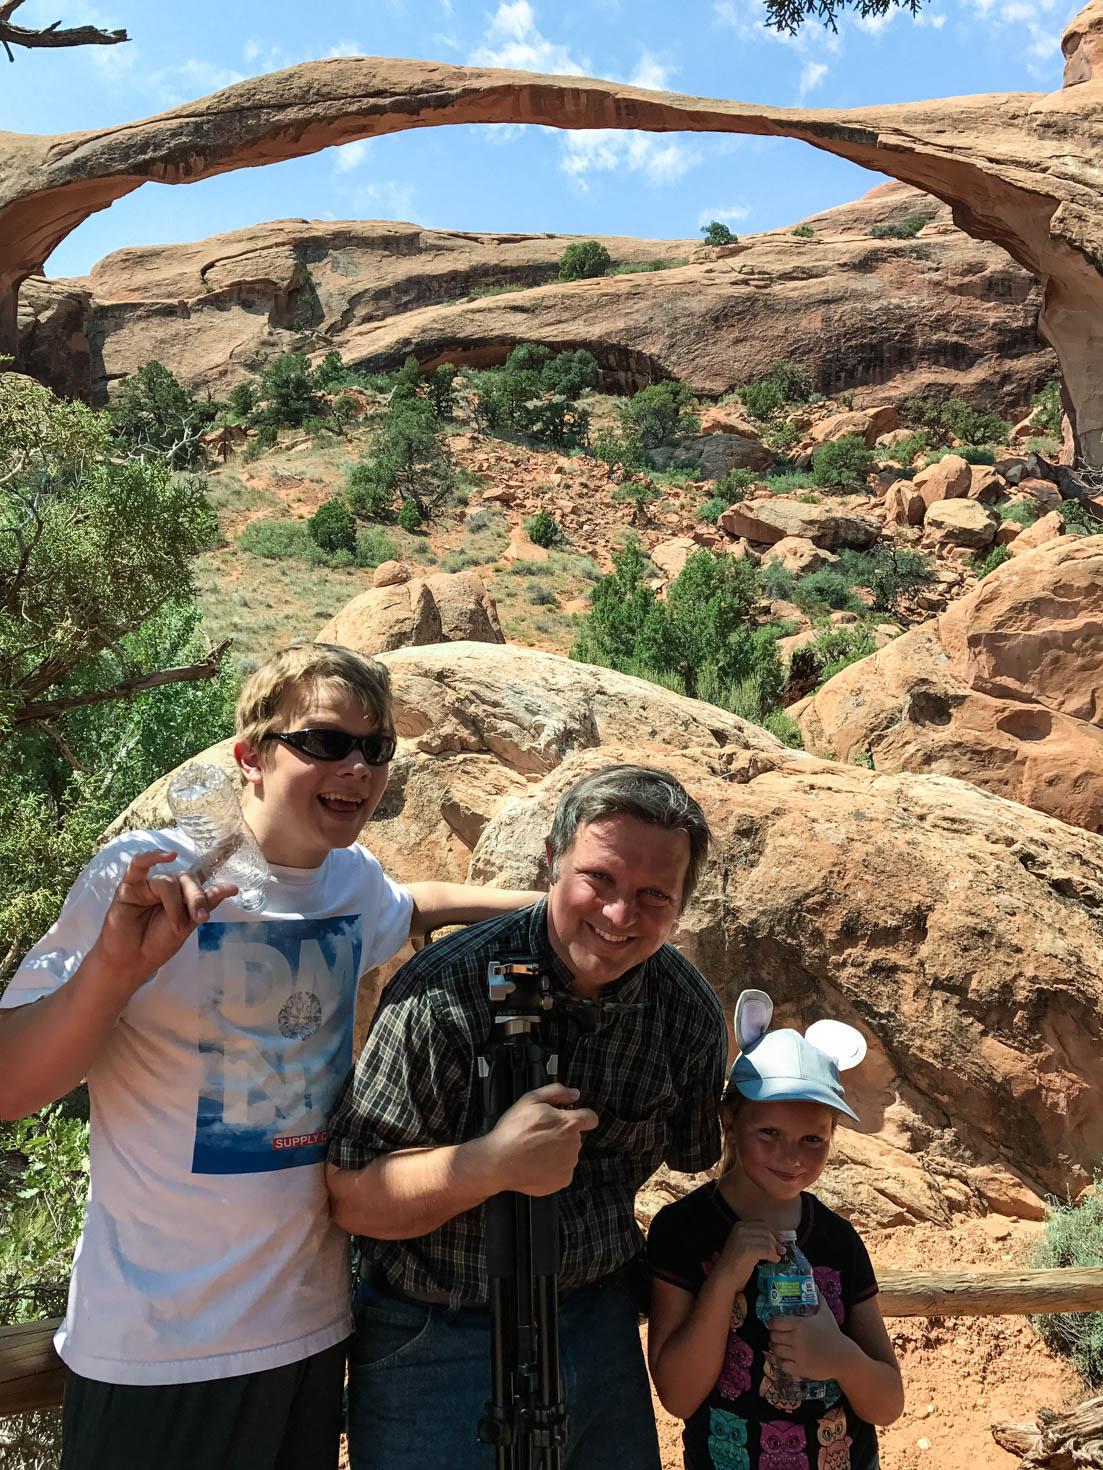 Landscape Arch, Arches National Park, Moab, Utah #vezzaniphotography